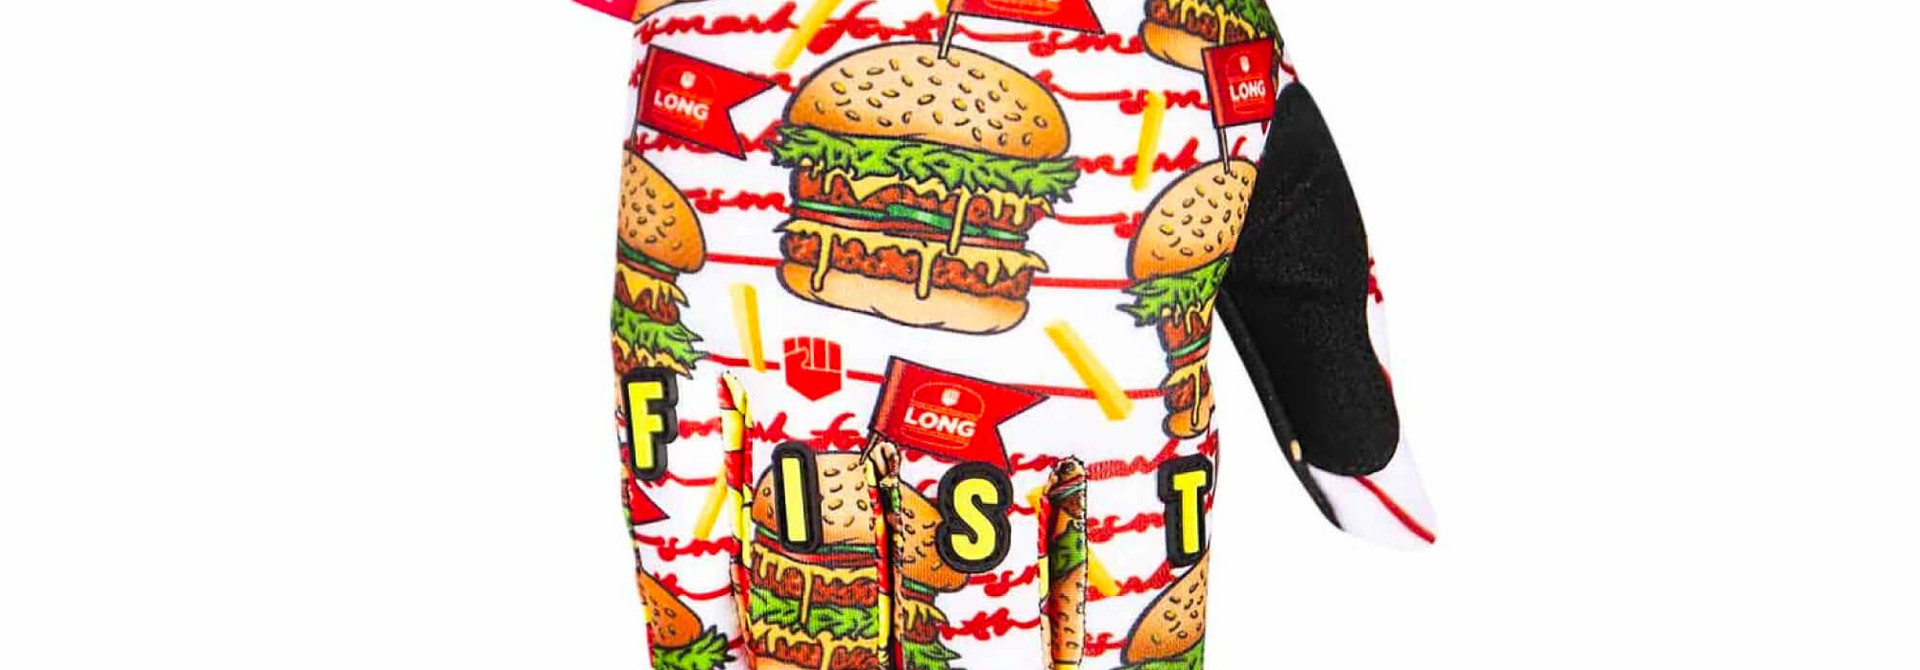 Dylan Long - Burgers